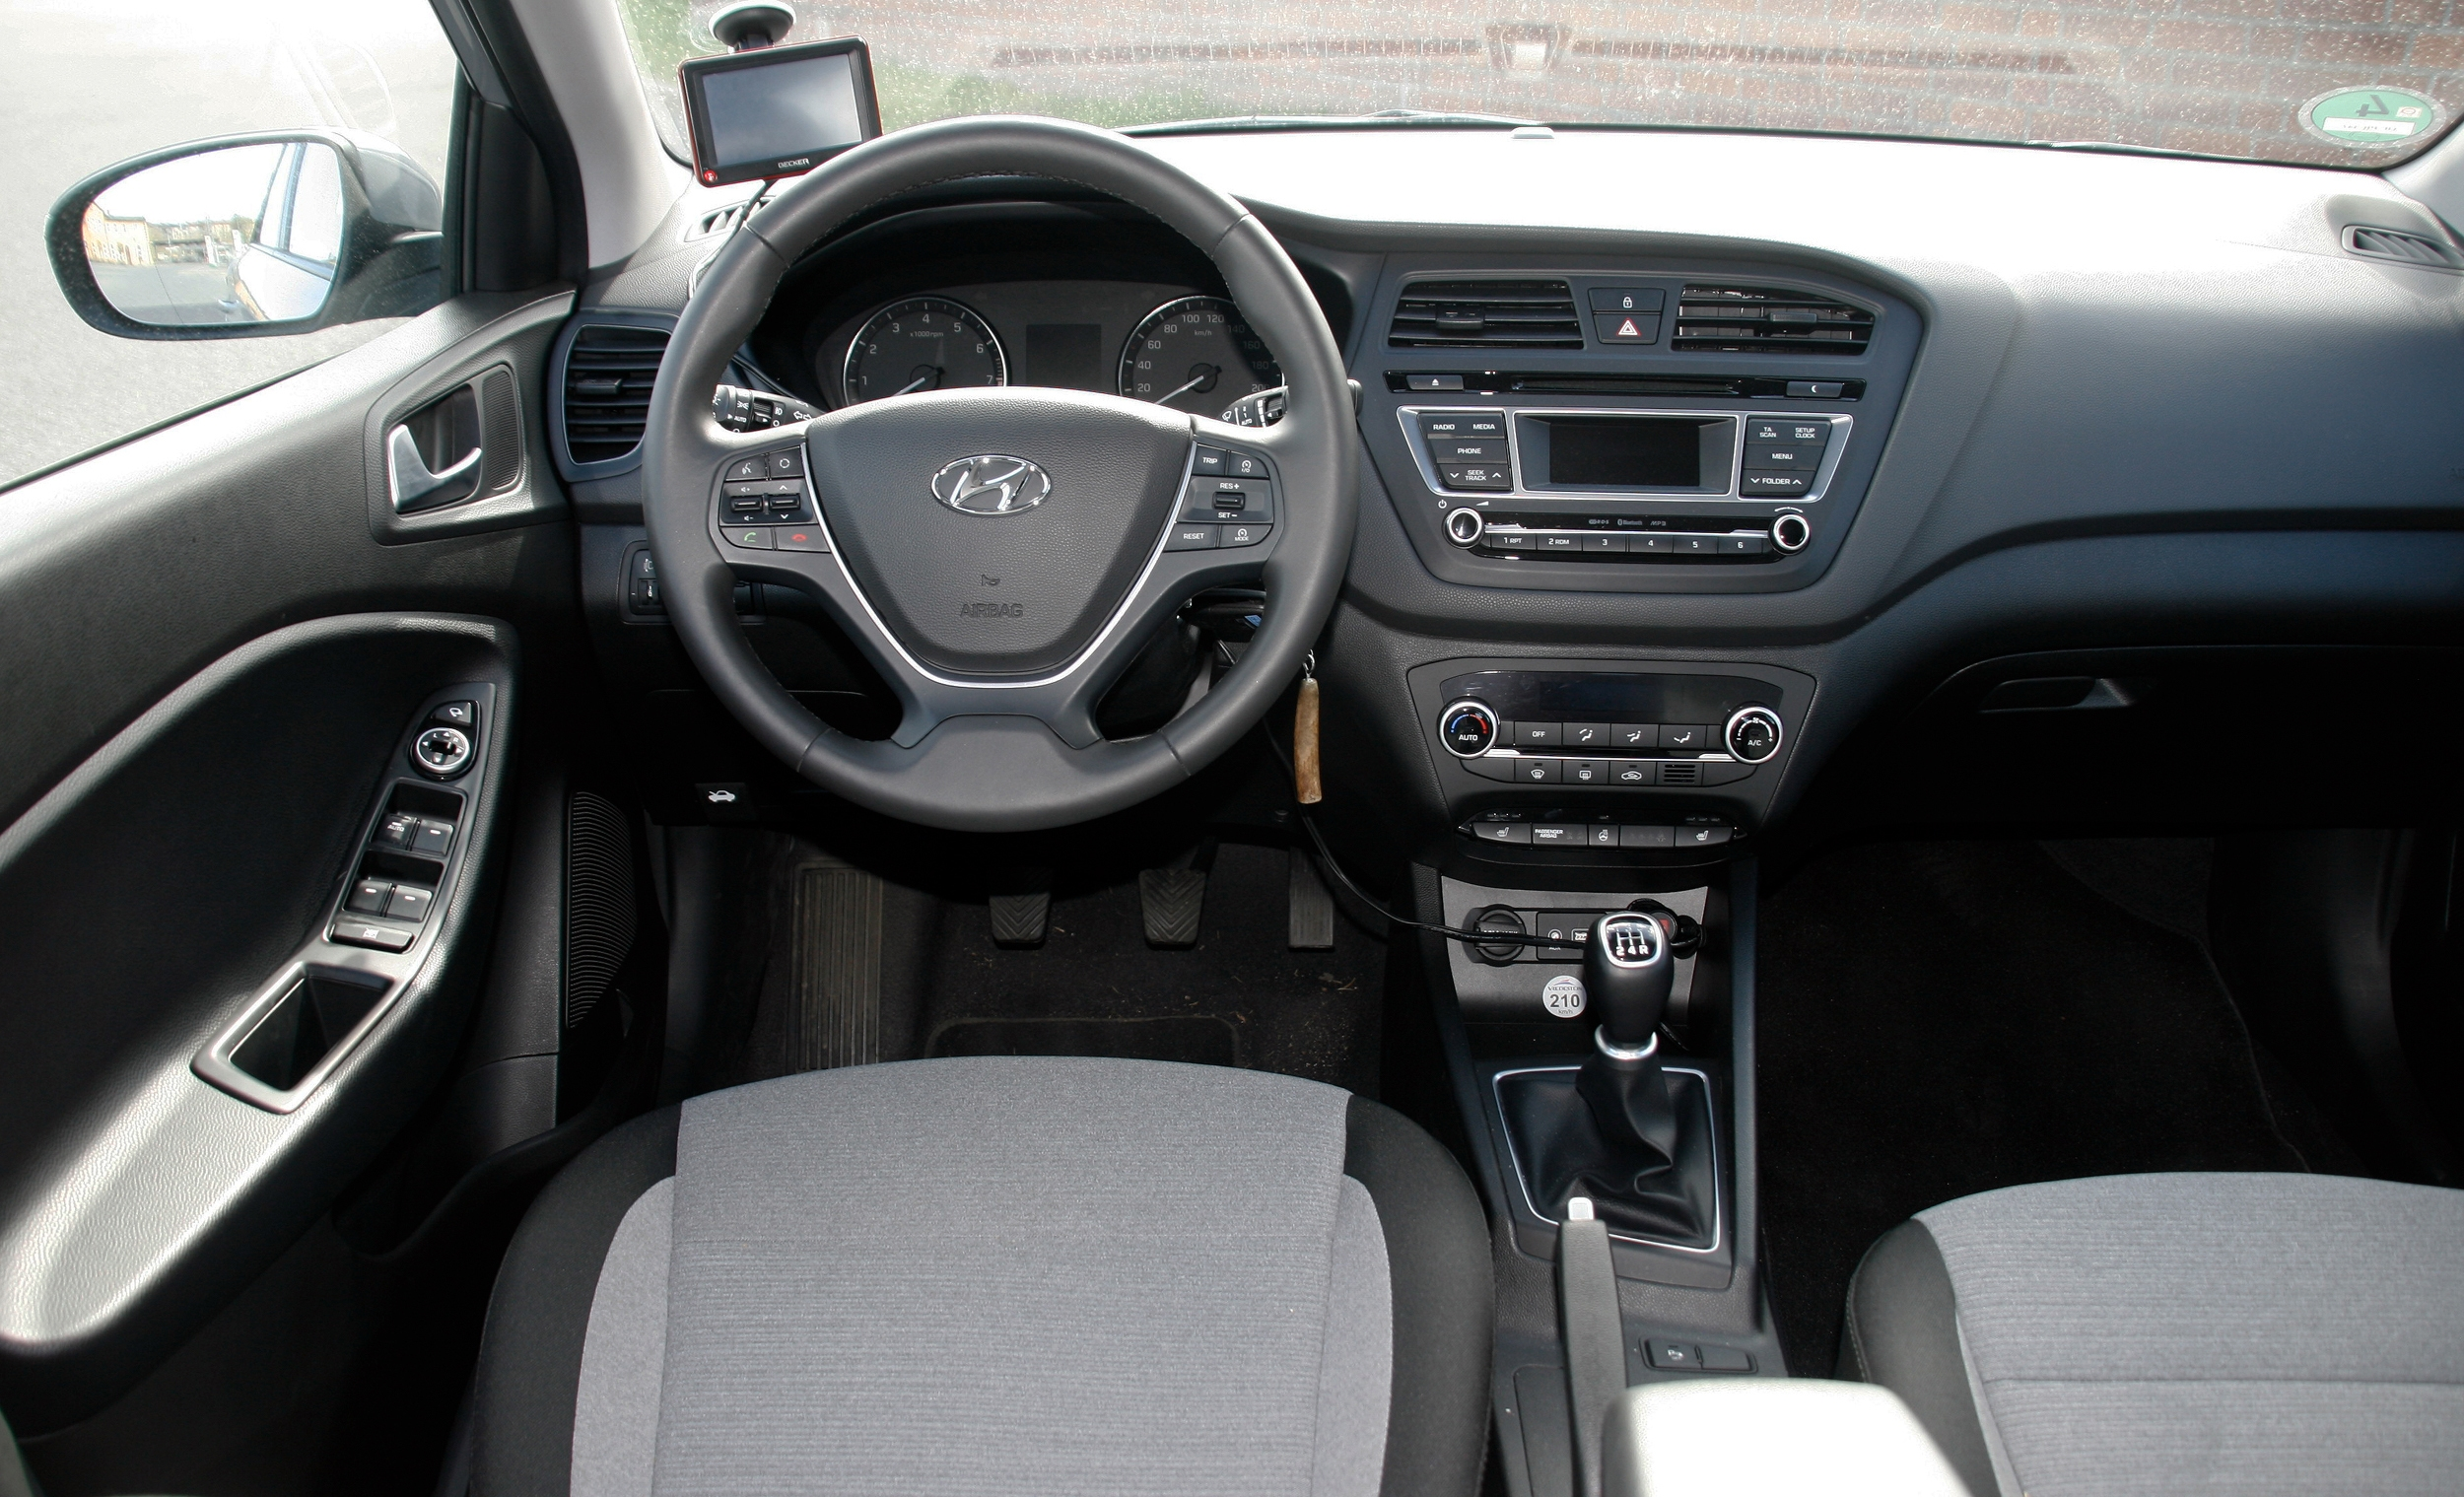 BB Heute: Test: Hyundai i20 1.2 Trend